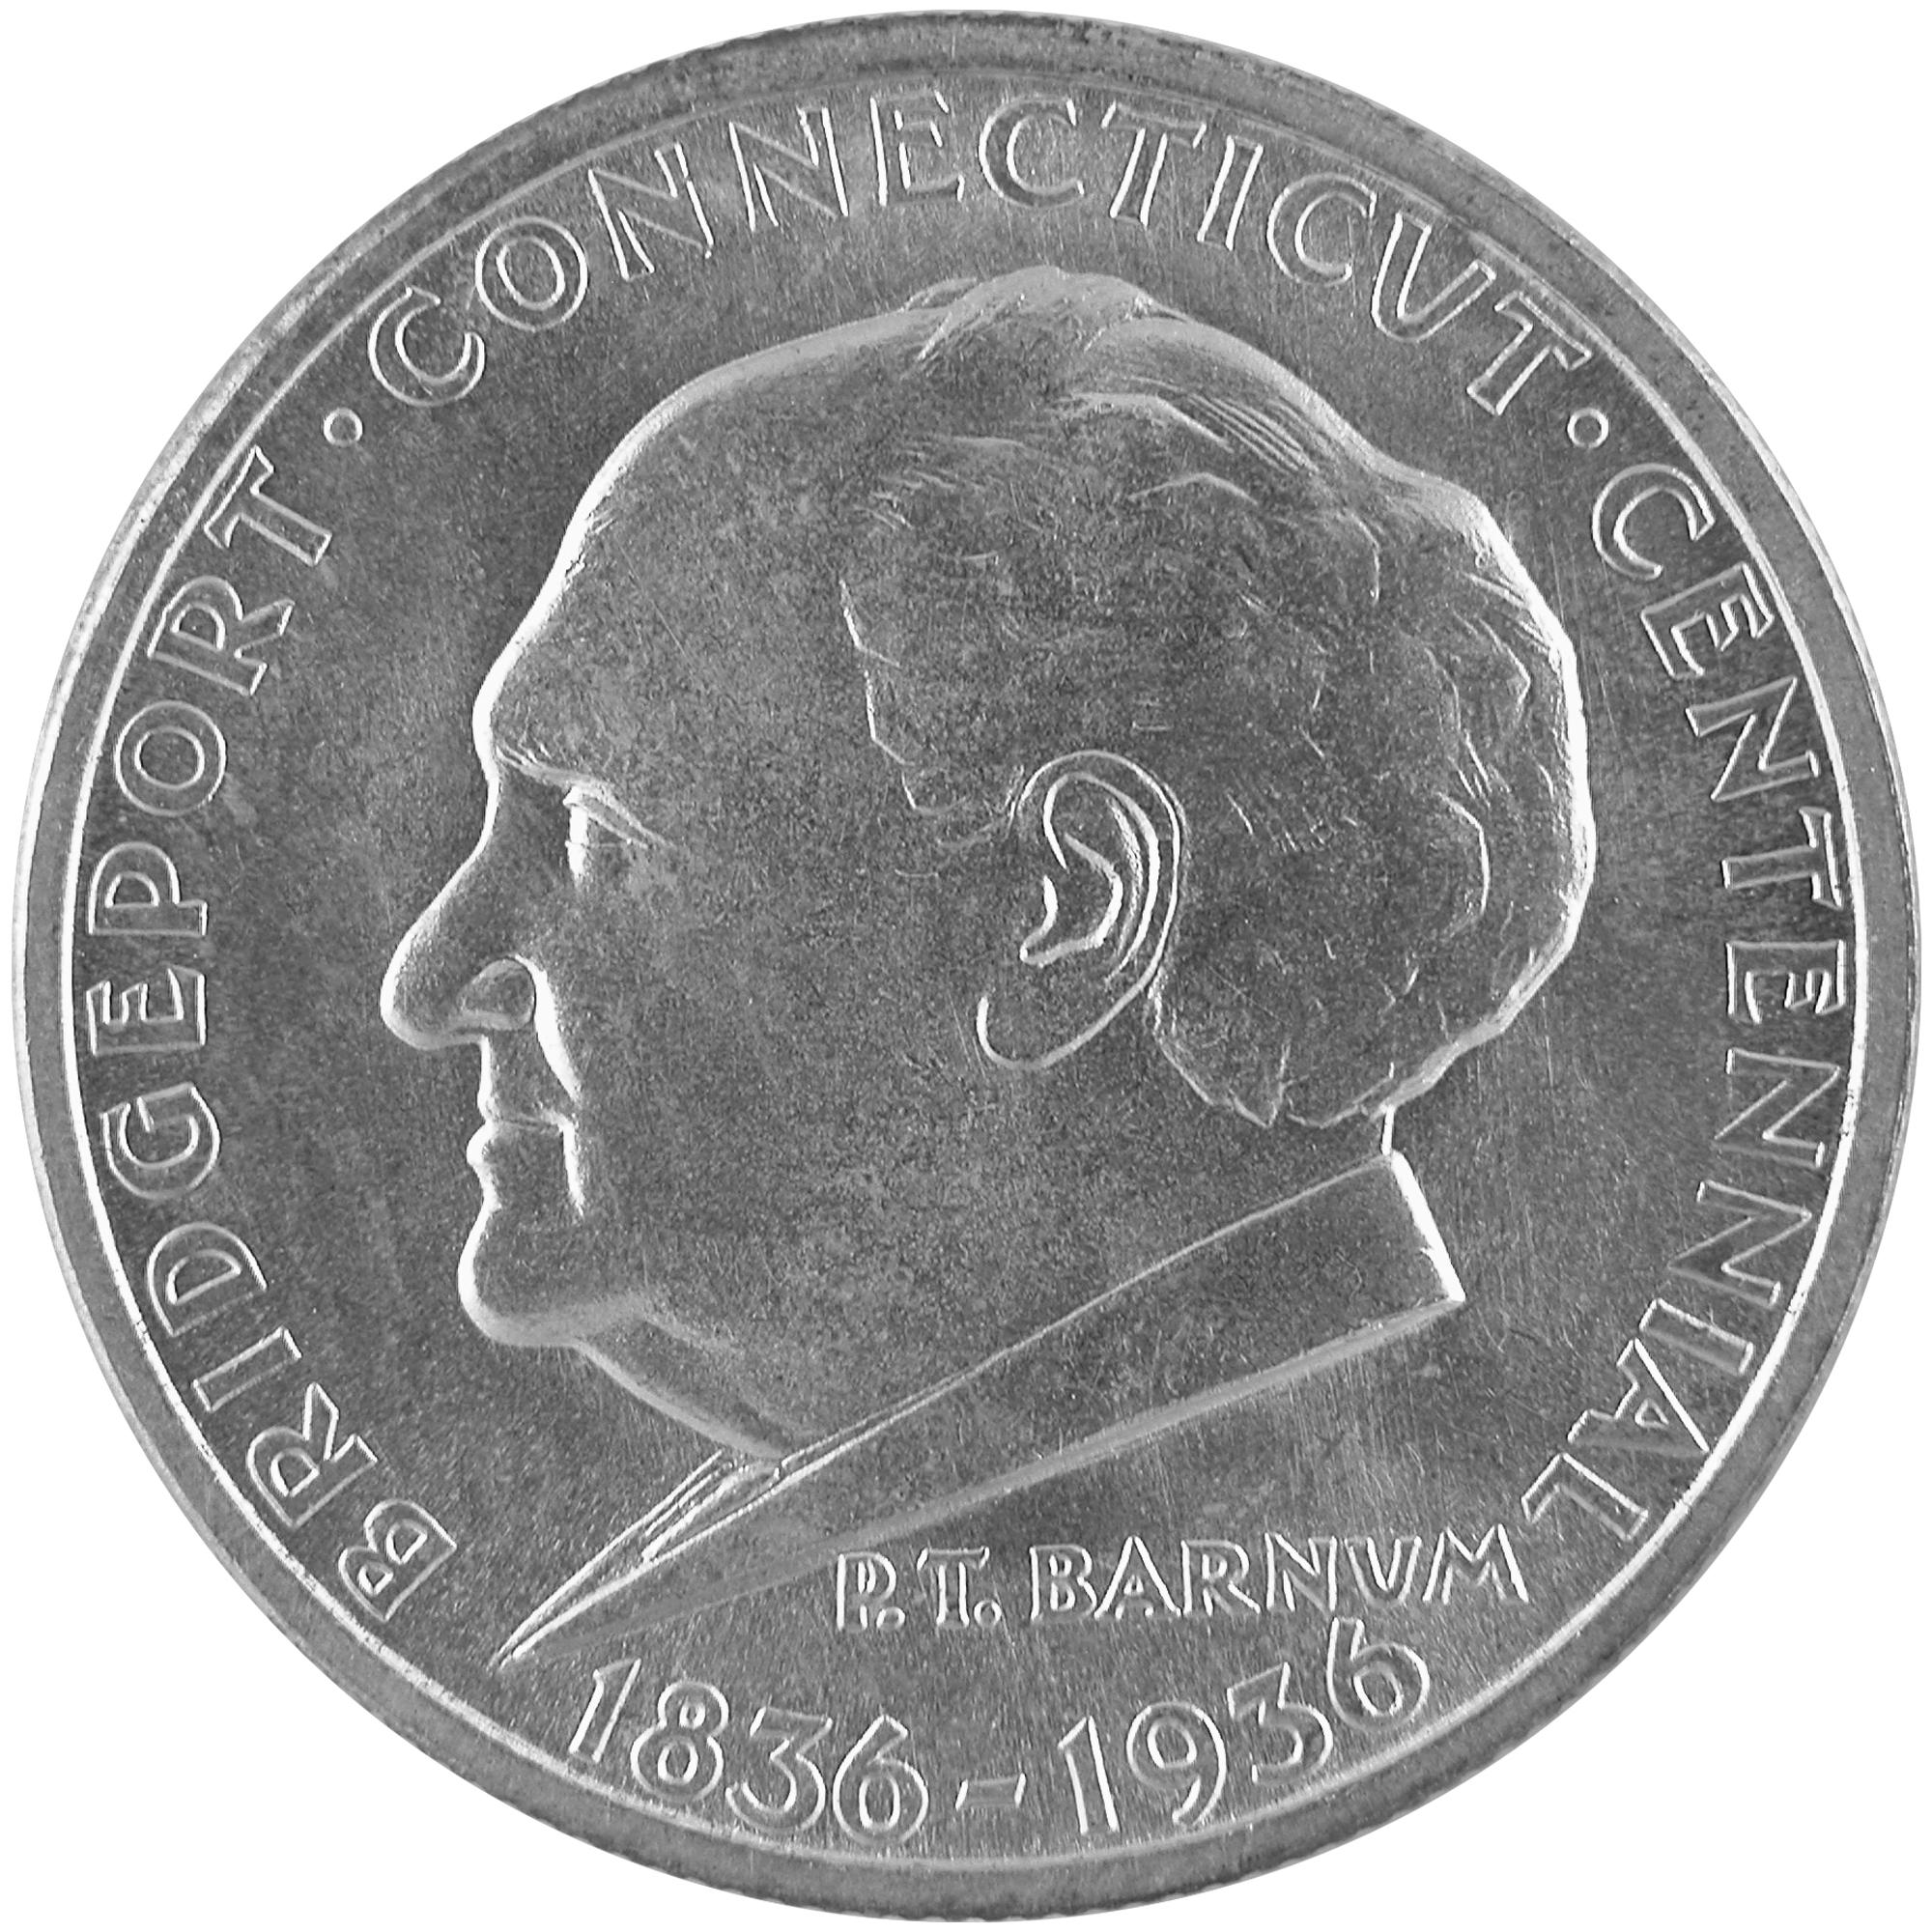 1936 Bridgeport Connecticut Centennial Commemorative Silver Half Dollar Coin Obverse